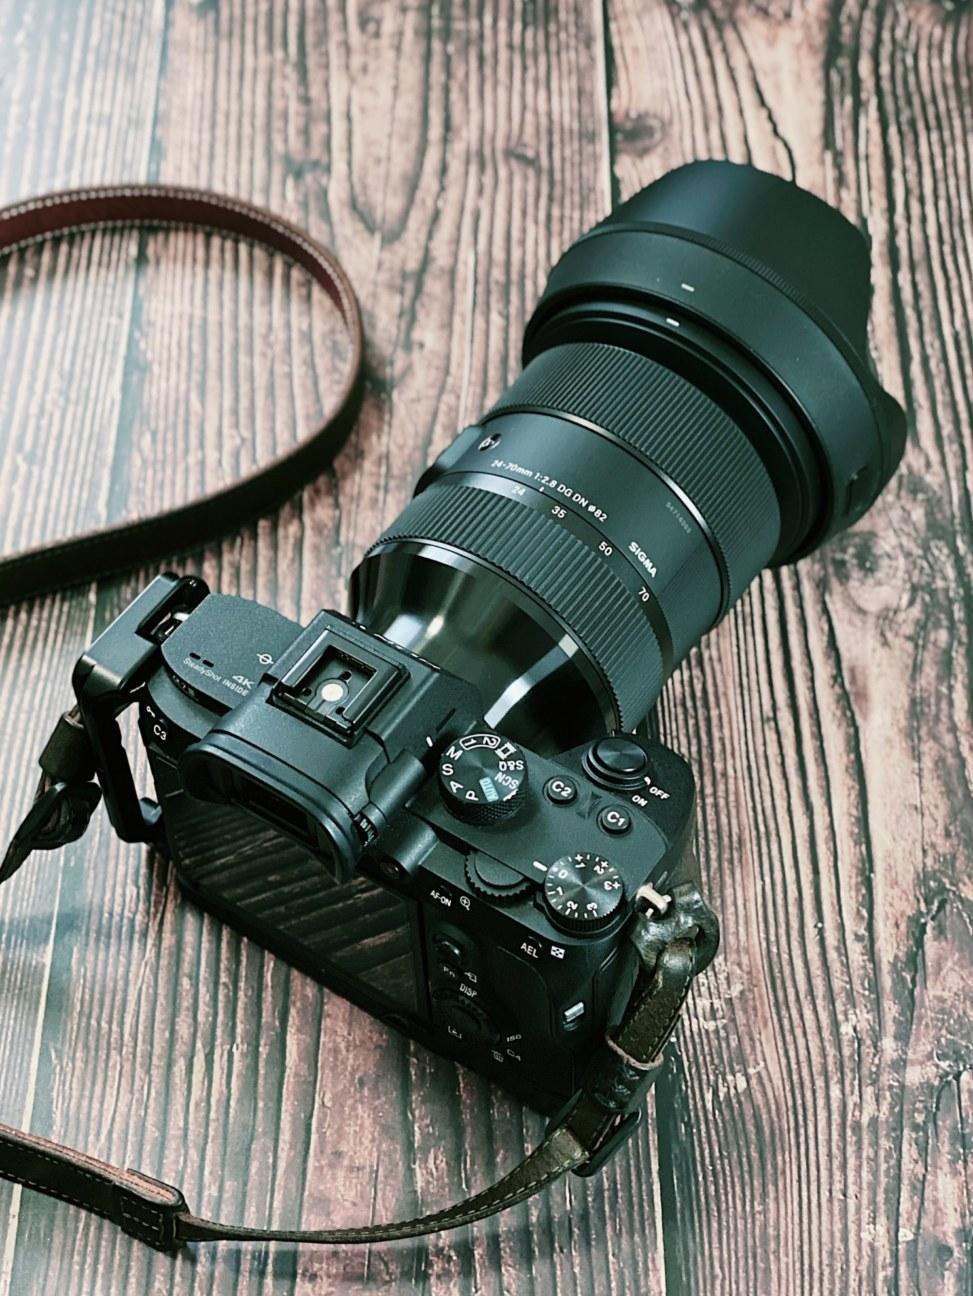 SIGMA 24-70mm F2.8 DG DN